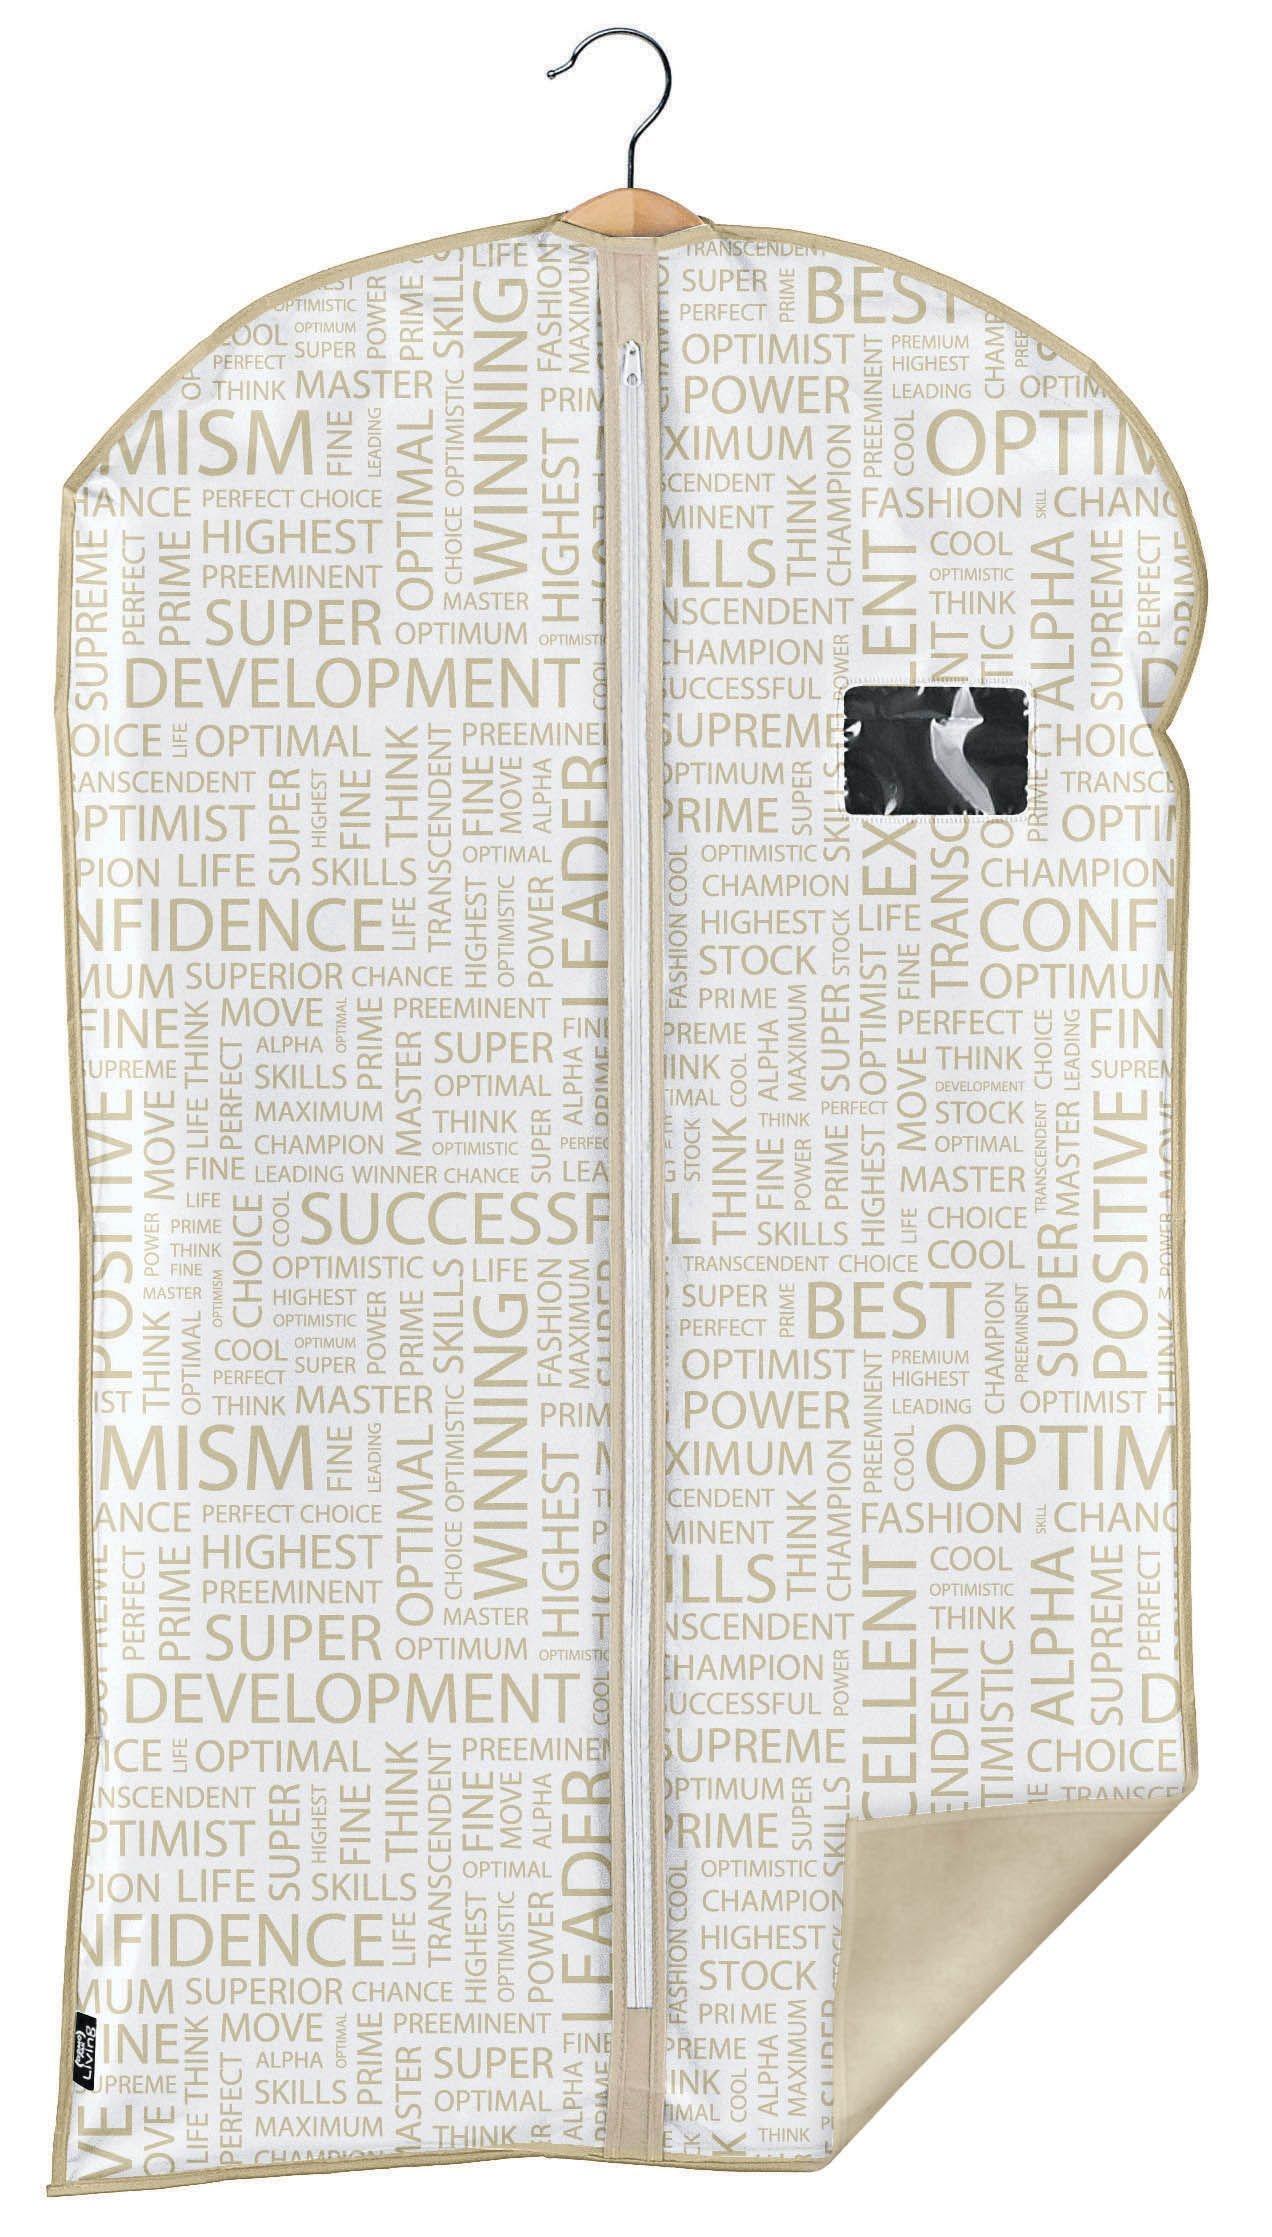 Husa pentru haine cu fermoar, Urban Alb / Grej, l60xH100 cm poza